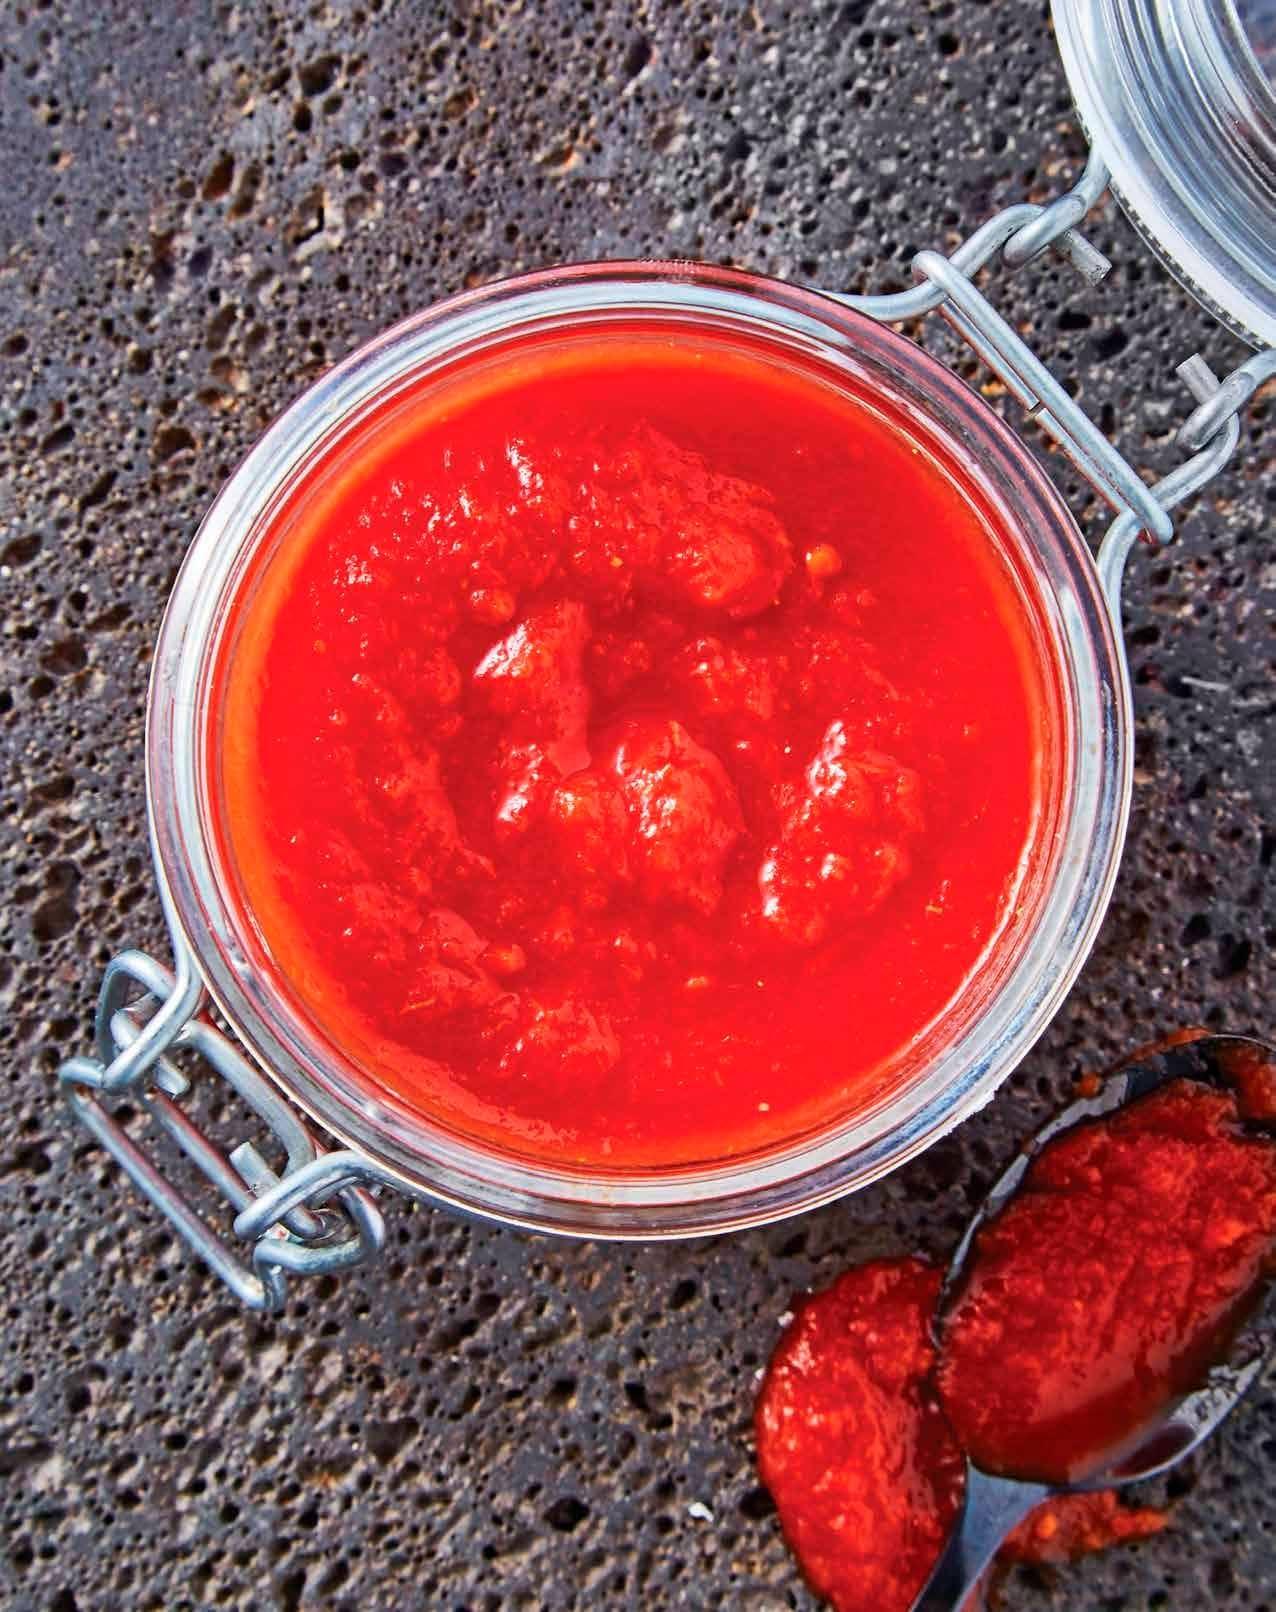 Jitomate – Una salsa: tres comidas